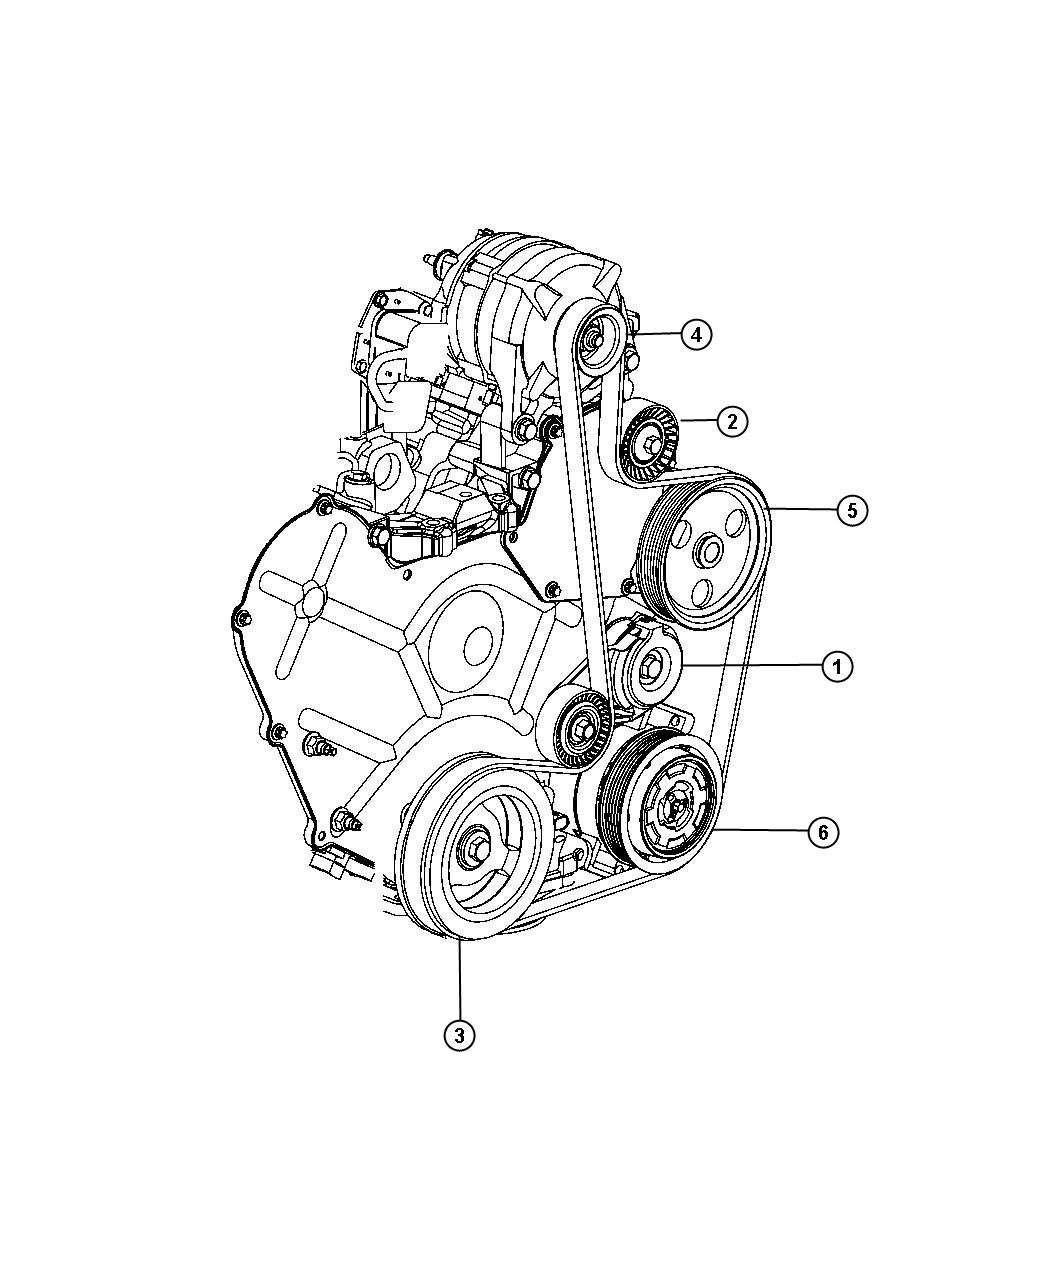 Chrysler Sebring Tensioner Belt Related Pulleys